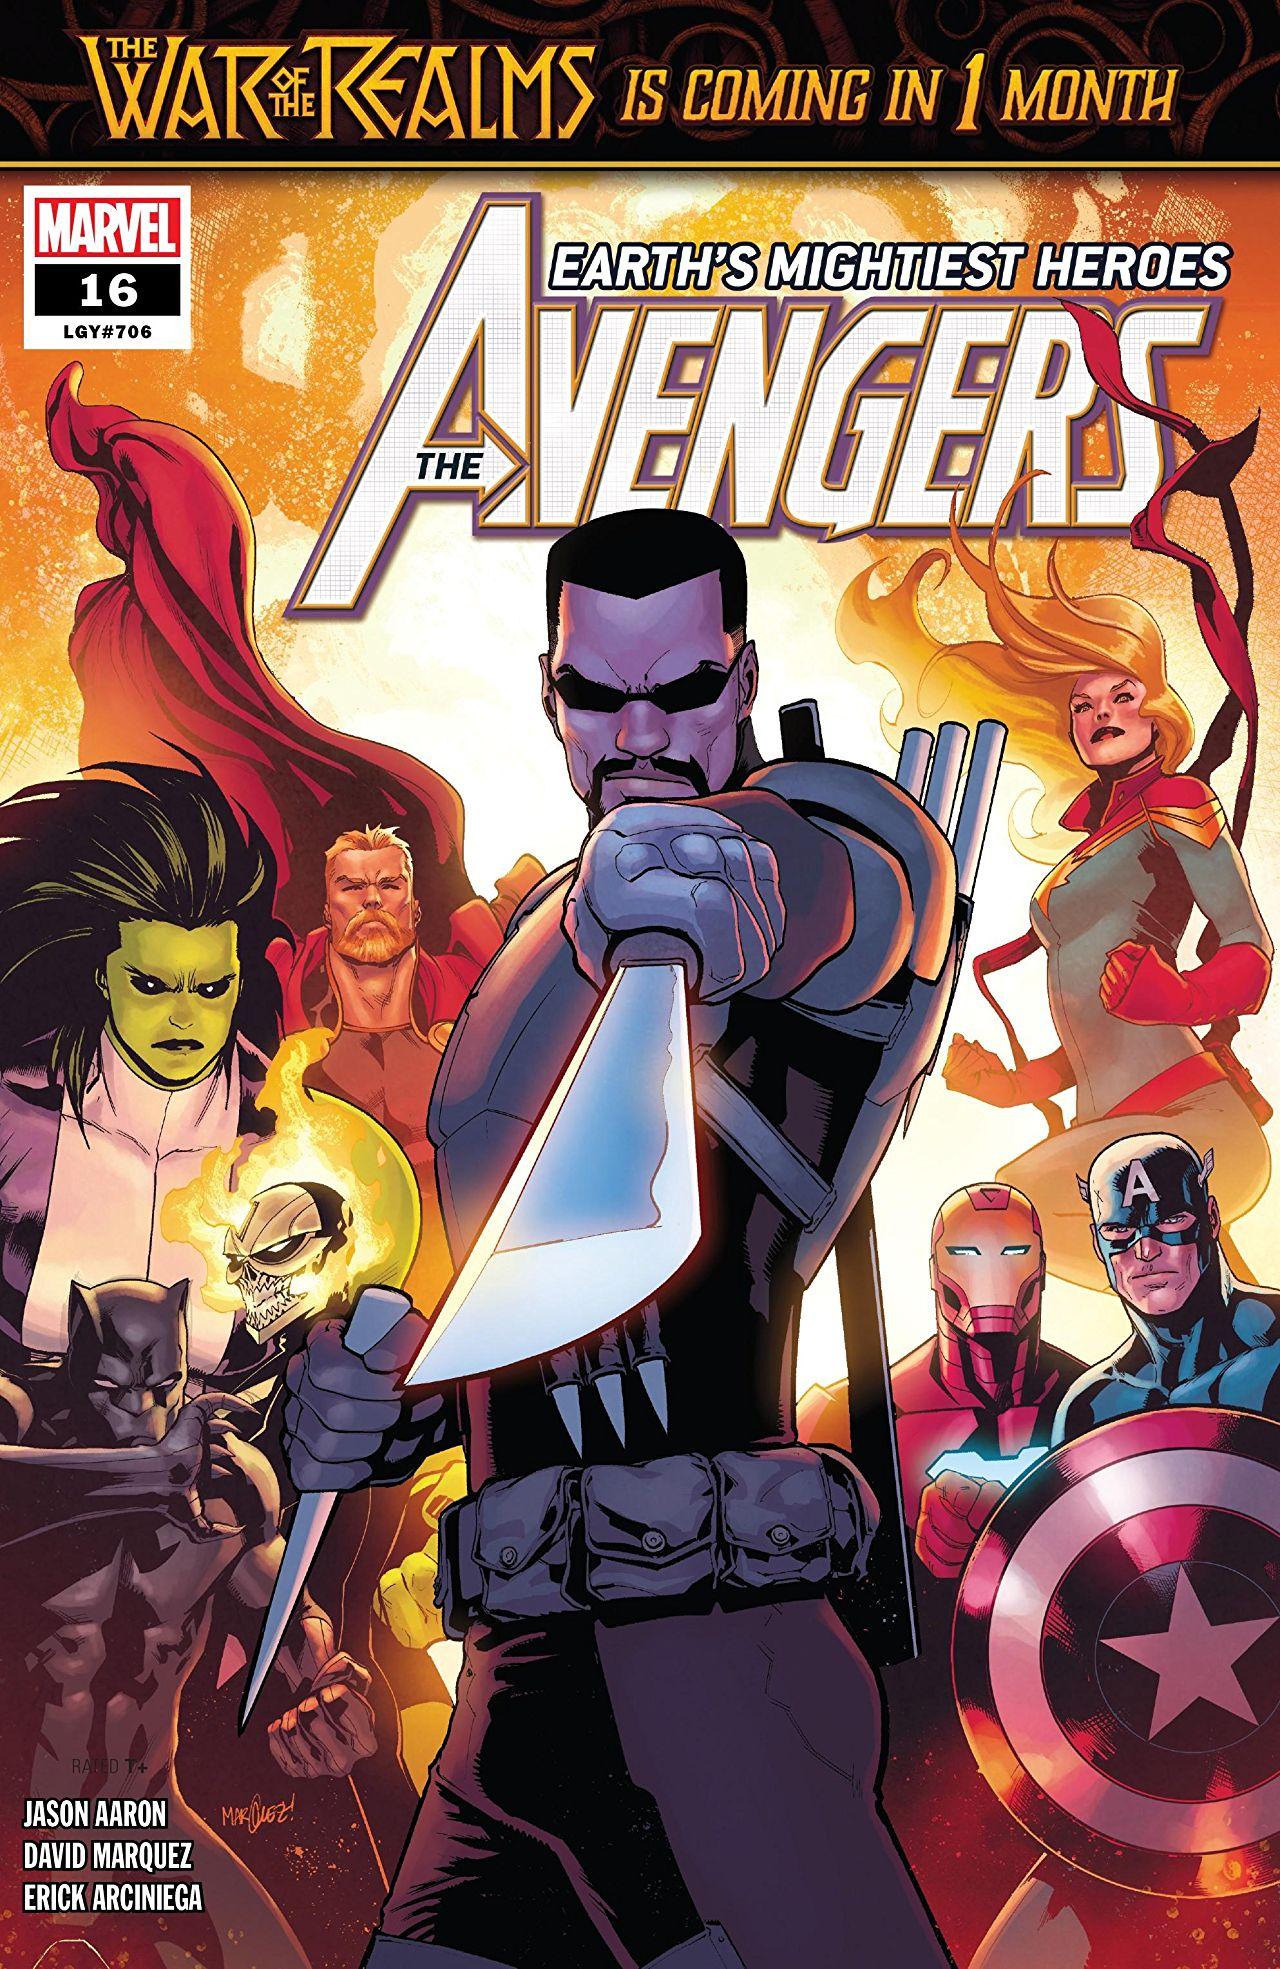 Avengers 16 - WAR OF THE VAMPIRES PART 3